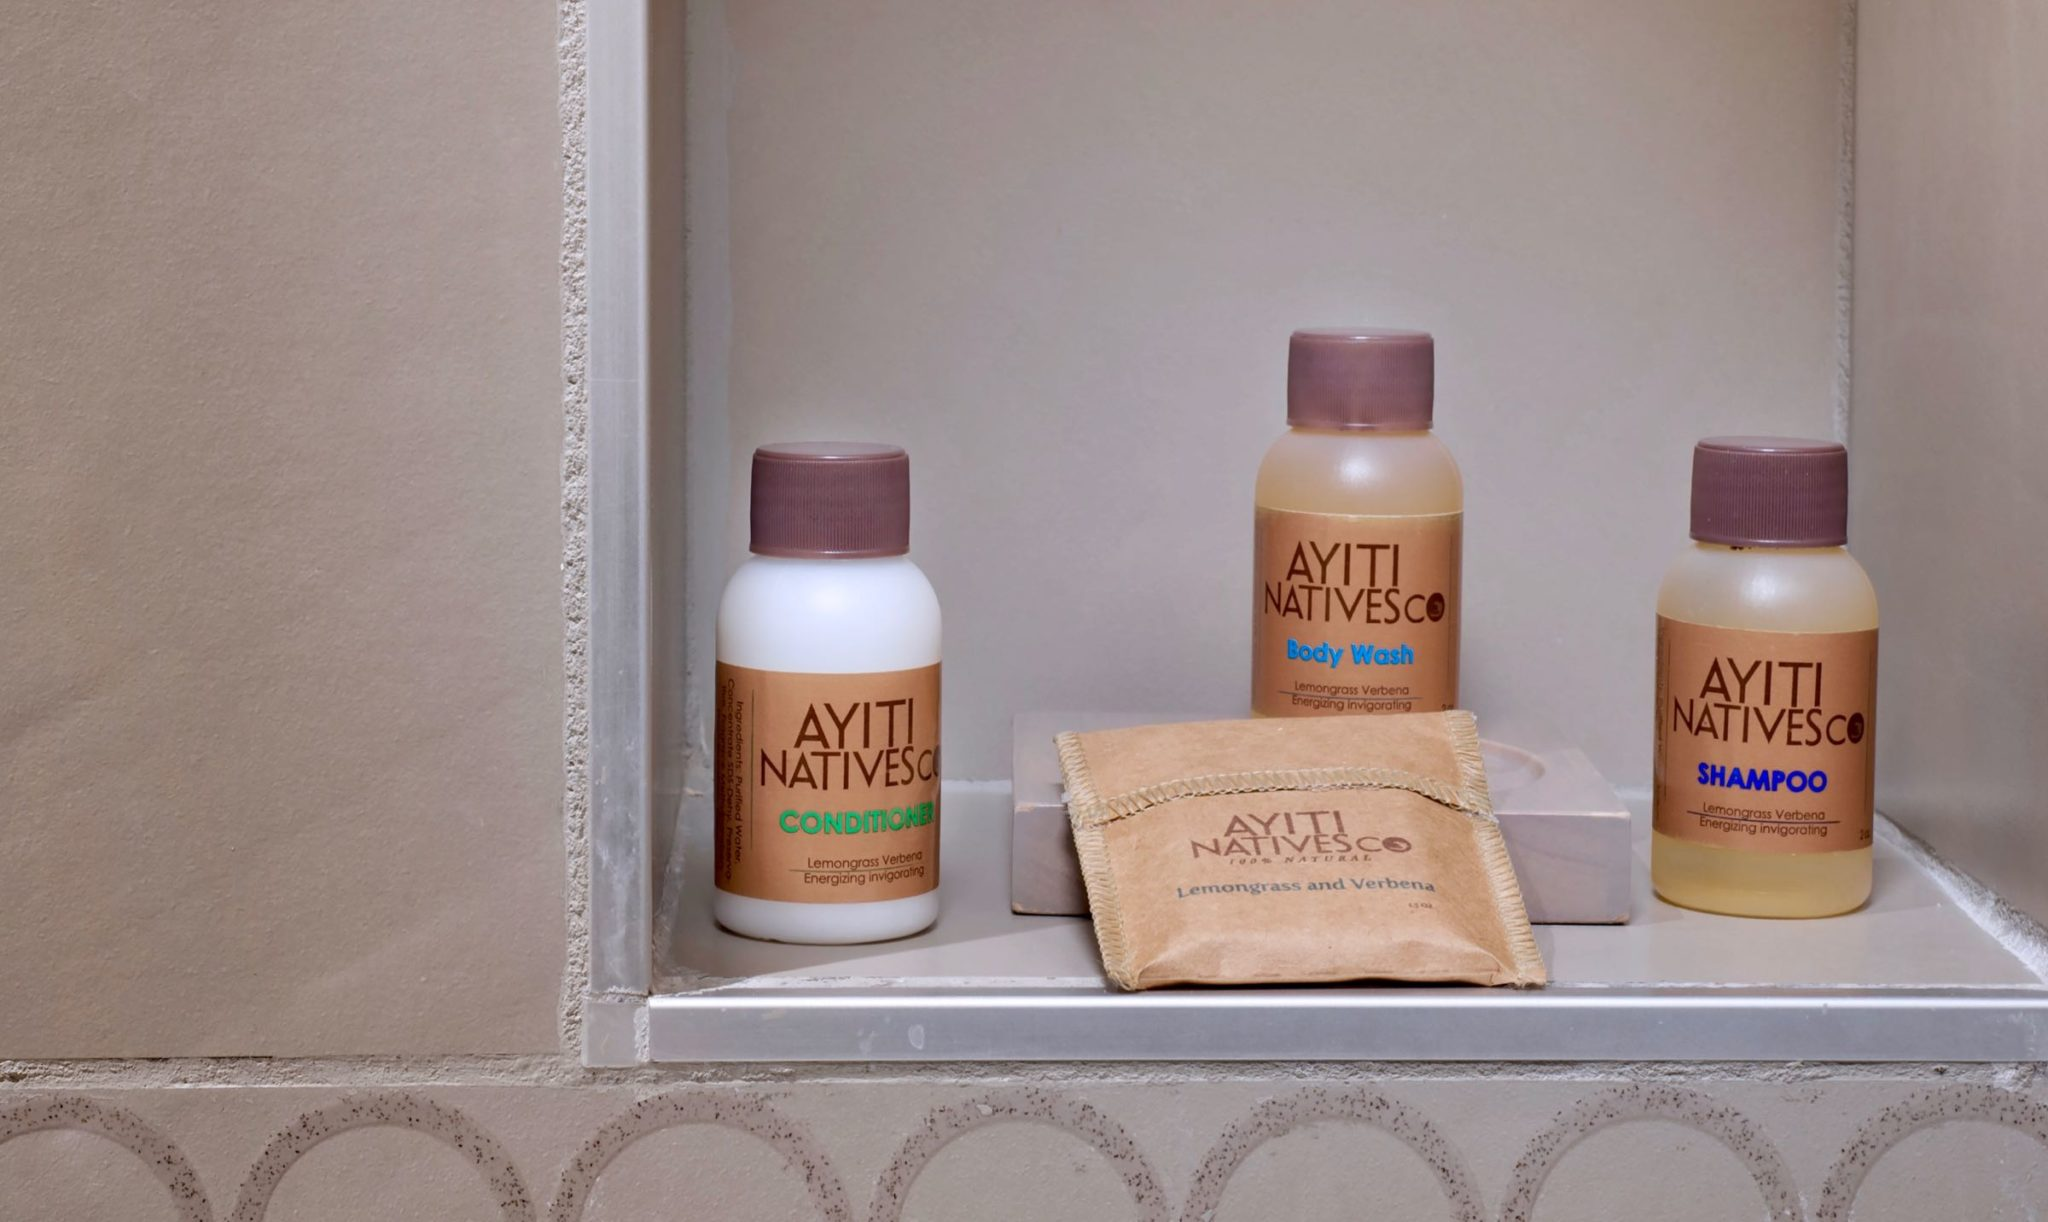 All-Natural Ayiti Native Bath Products: Uncommon Buy